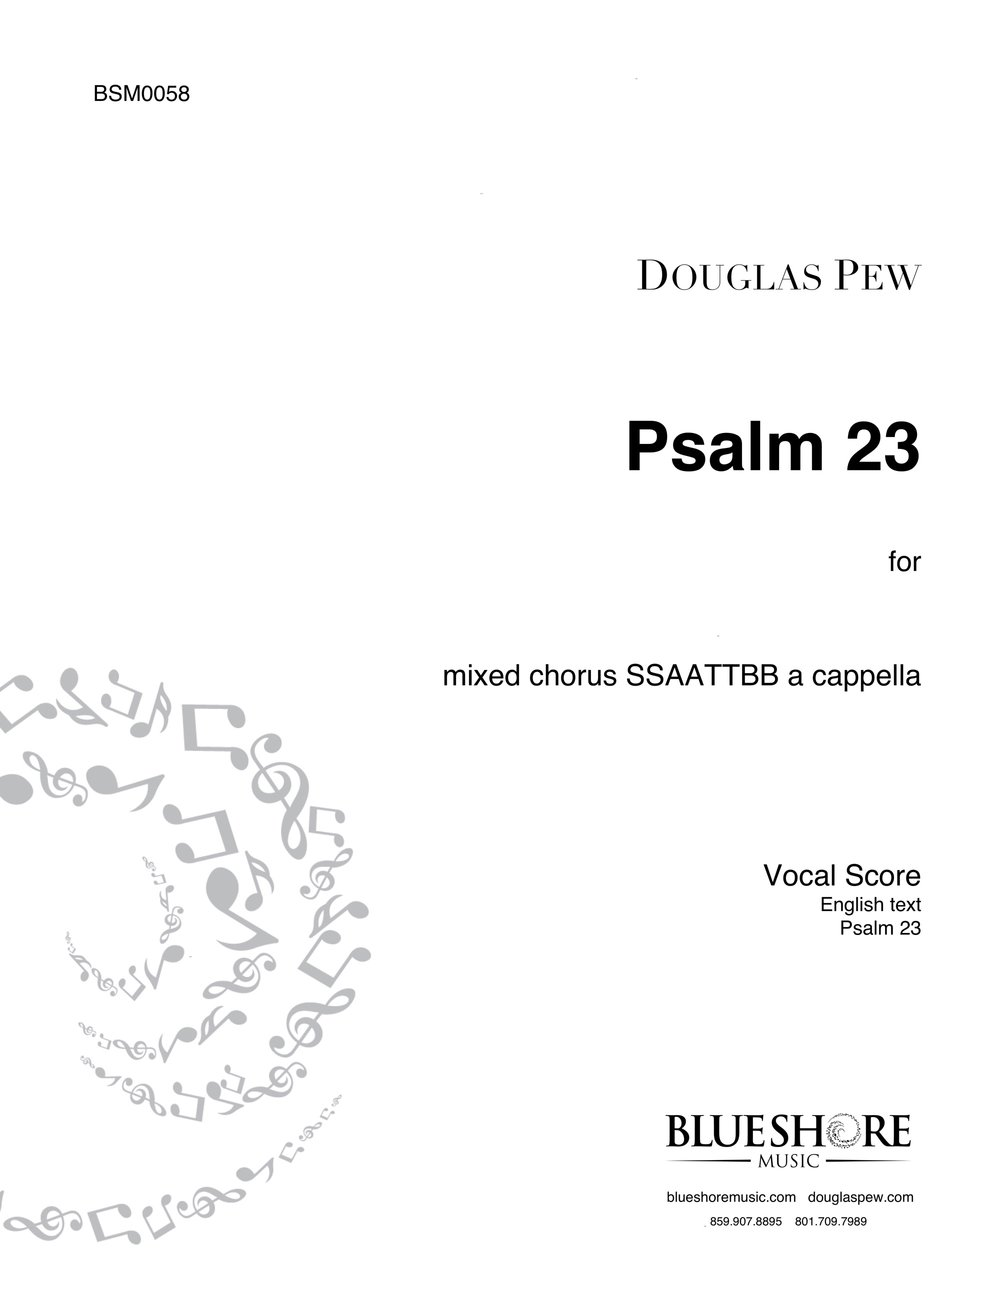 Pew_BSM0061_Psalm23_VocalScore_Cover_smallest.jpg